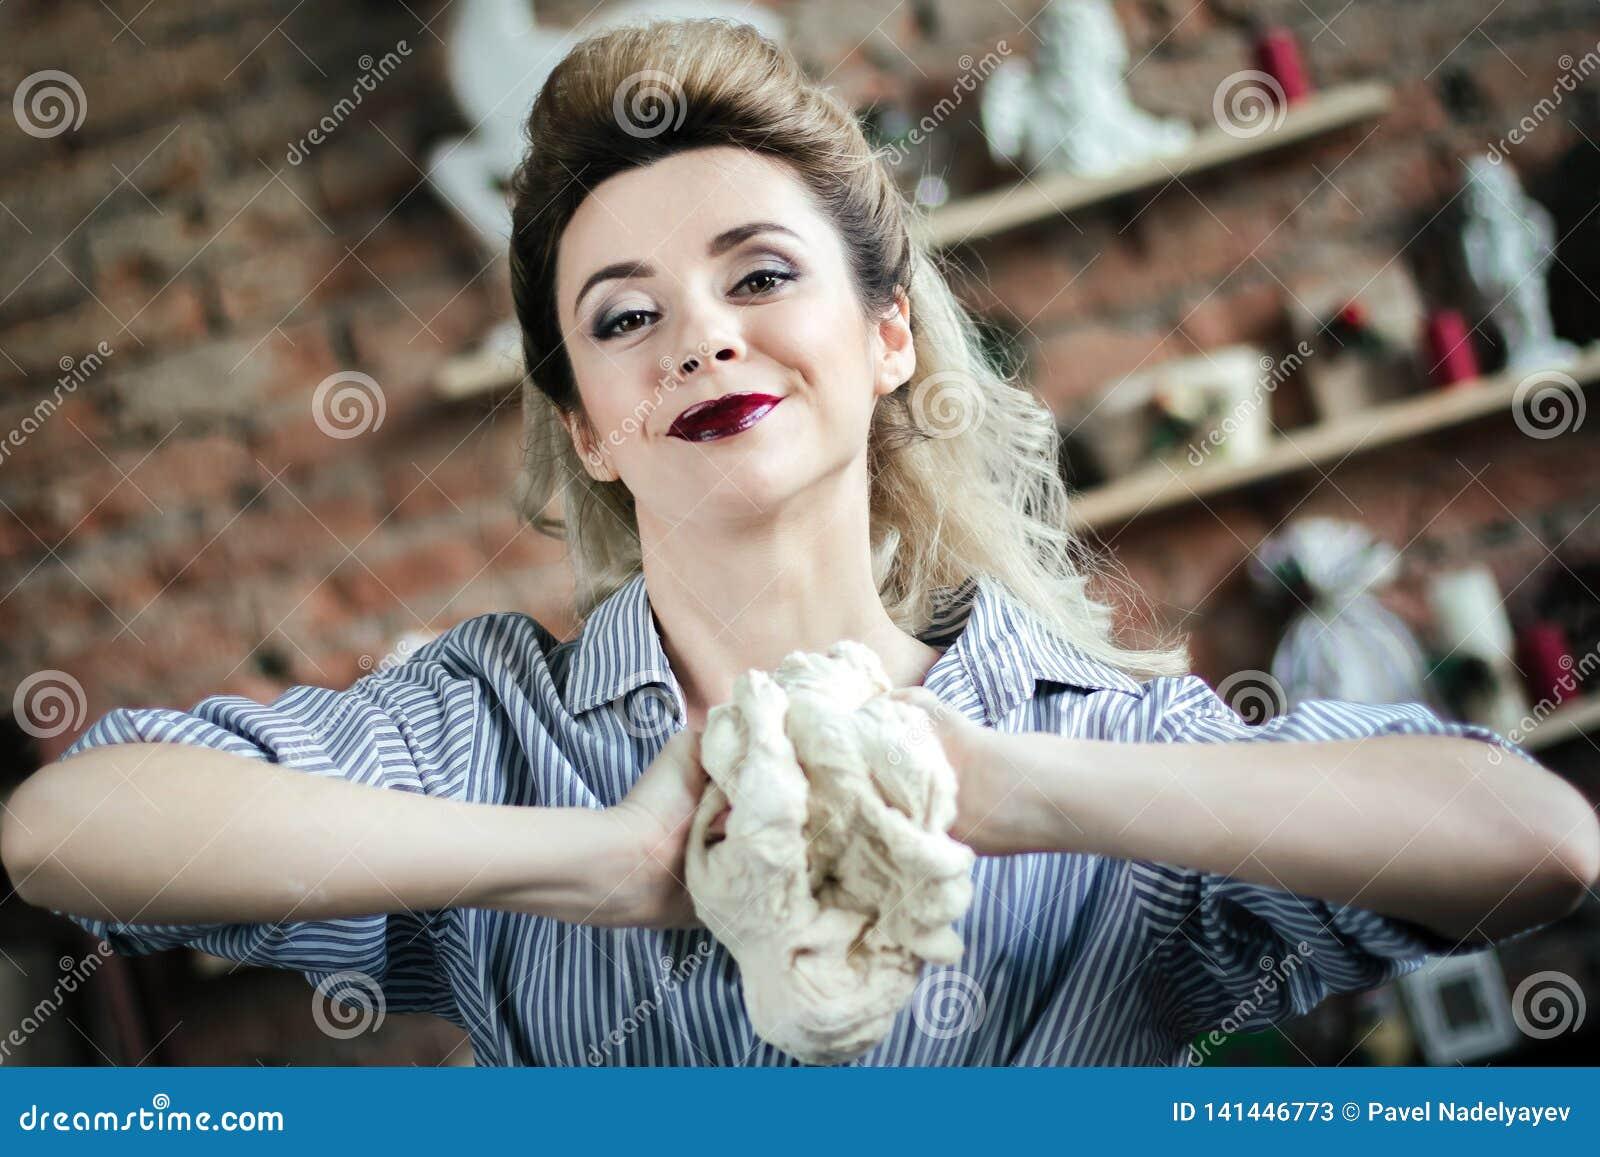 La jeune femme sexy prépare la pâte dans la cuisine La fille blonde sur la cuisine malaxe la pâte à la main Jeune femme heureuse